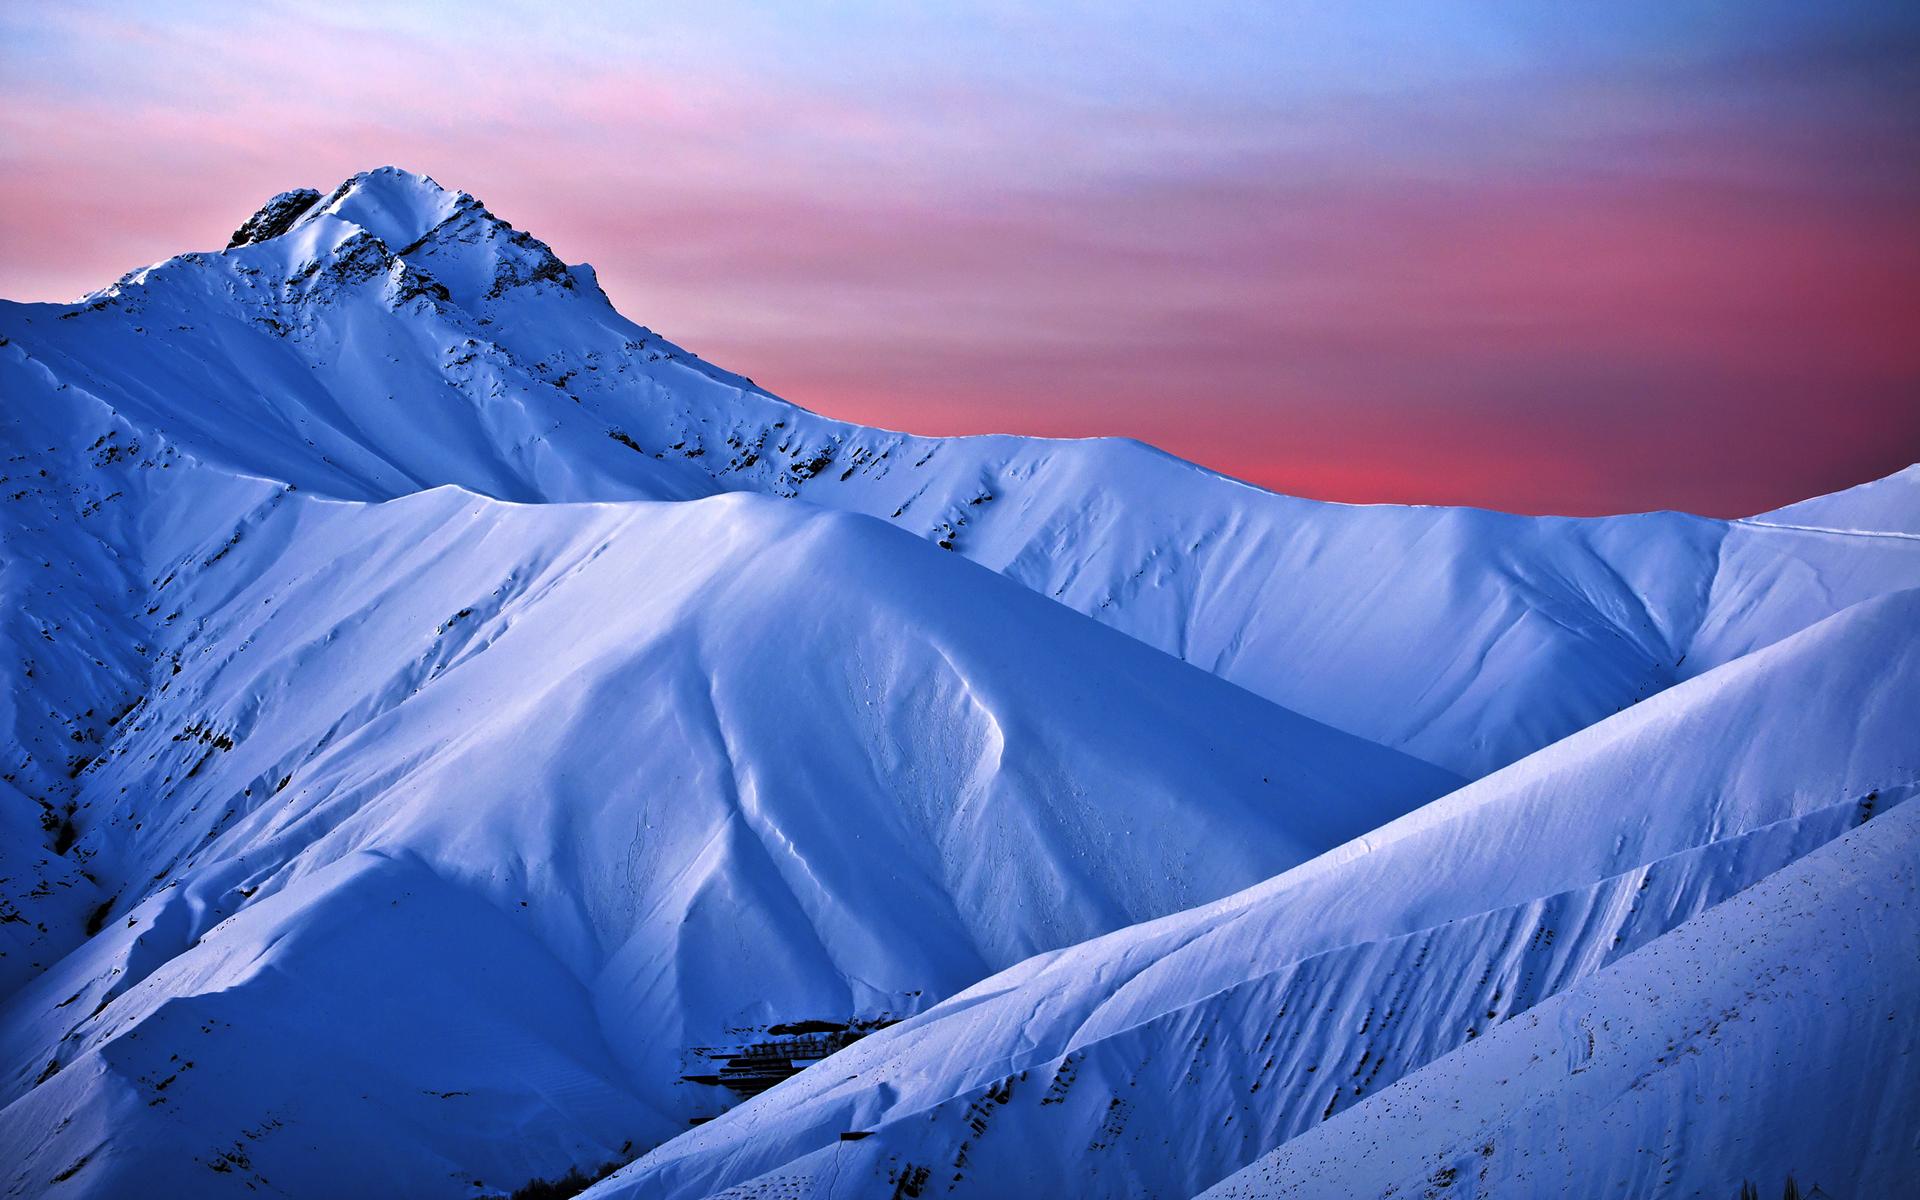 Montañas de nieve - 1920x1200